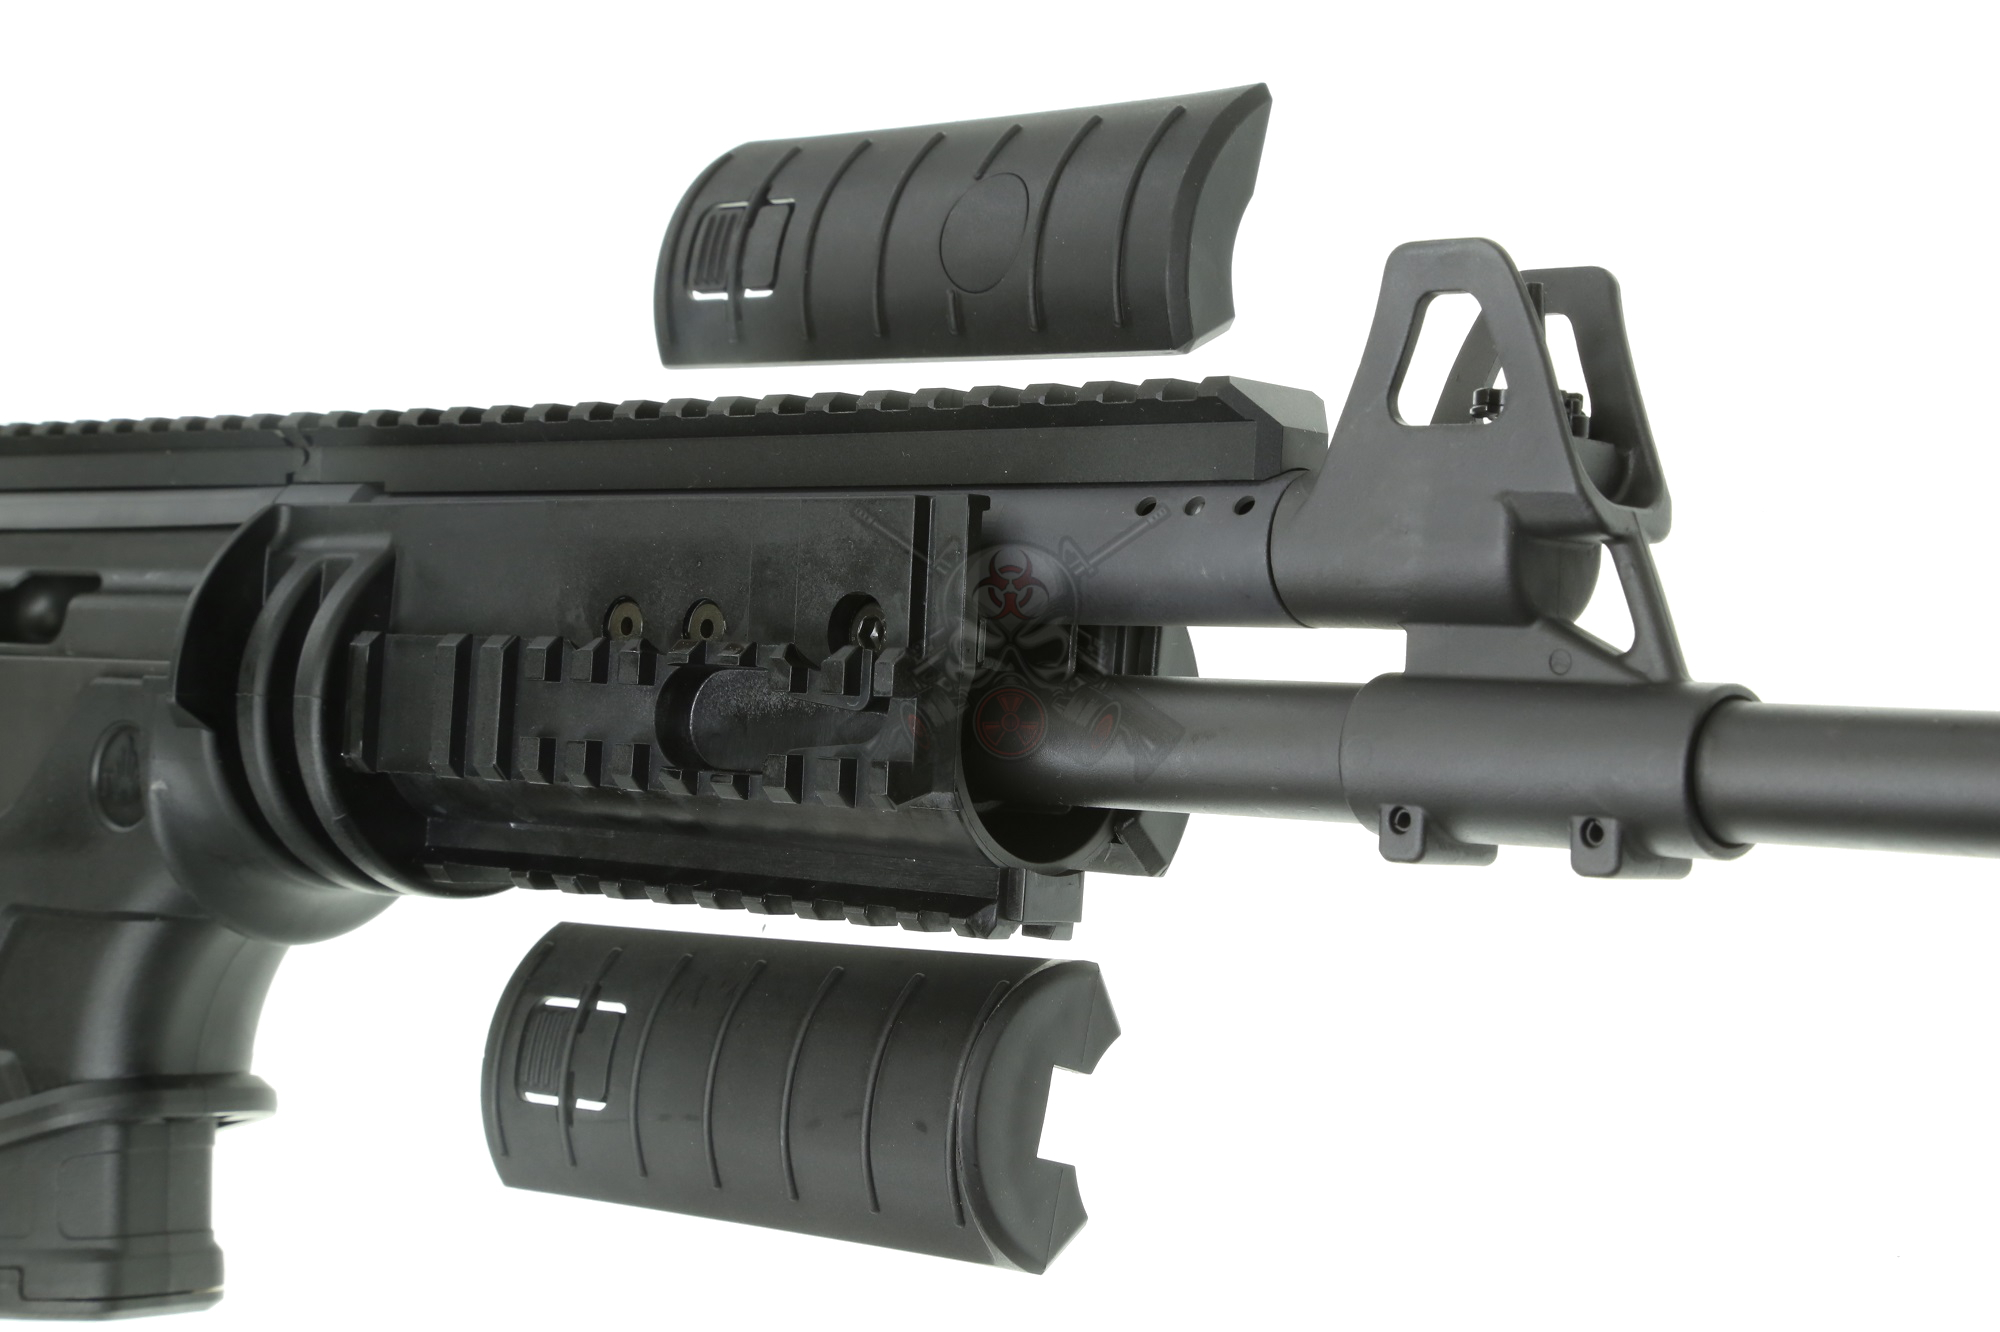 IWI Galil ACE CA COMPLIANT 7 62NATO Rifle 16'' barrel Rifle w/ fixed length  non-folding buttstock, grip wrap & IWI factory Muzzle Break (1) 10rd mag -